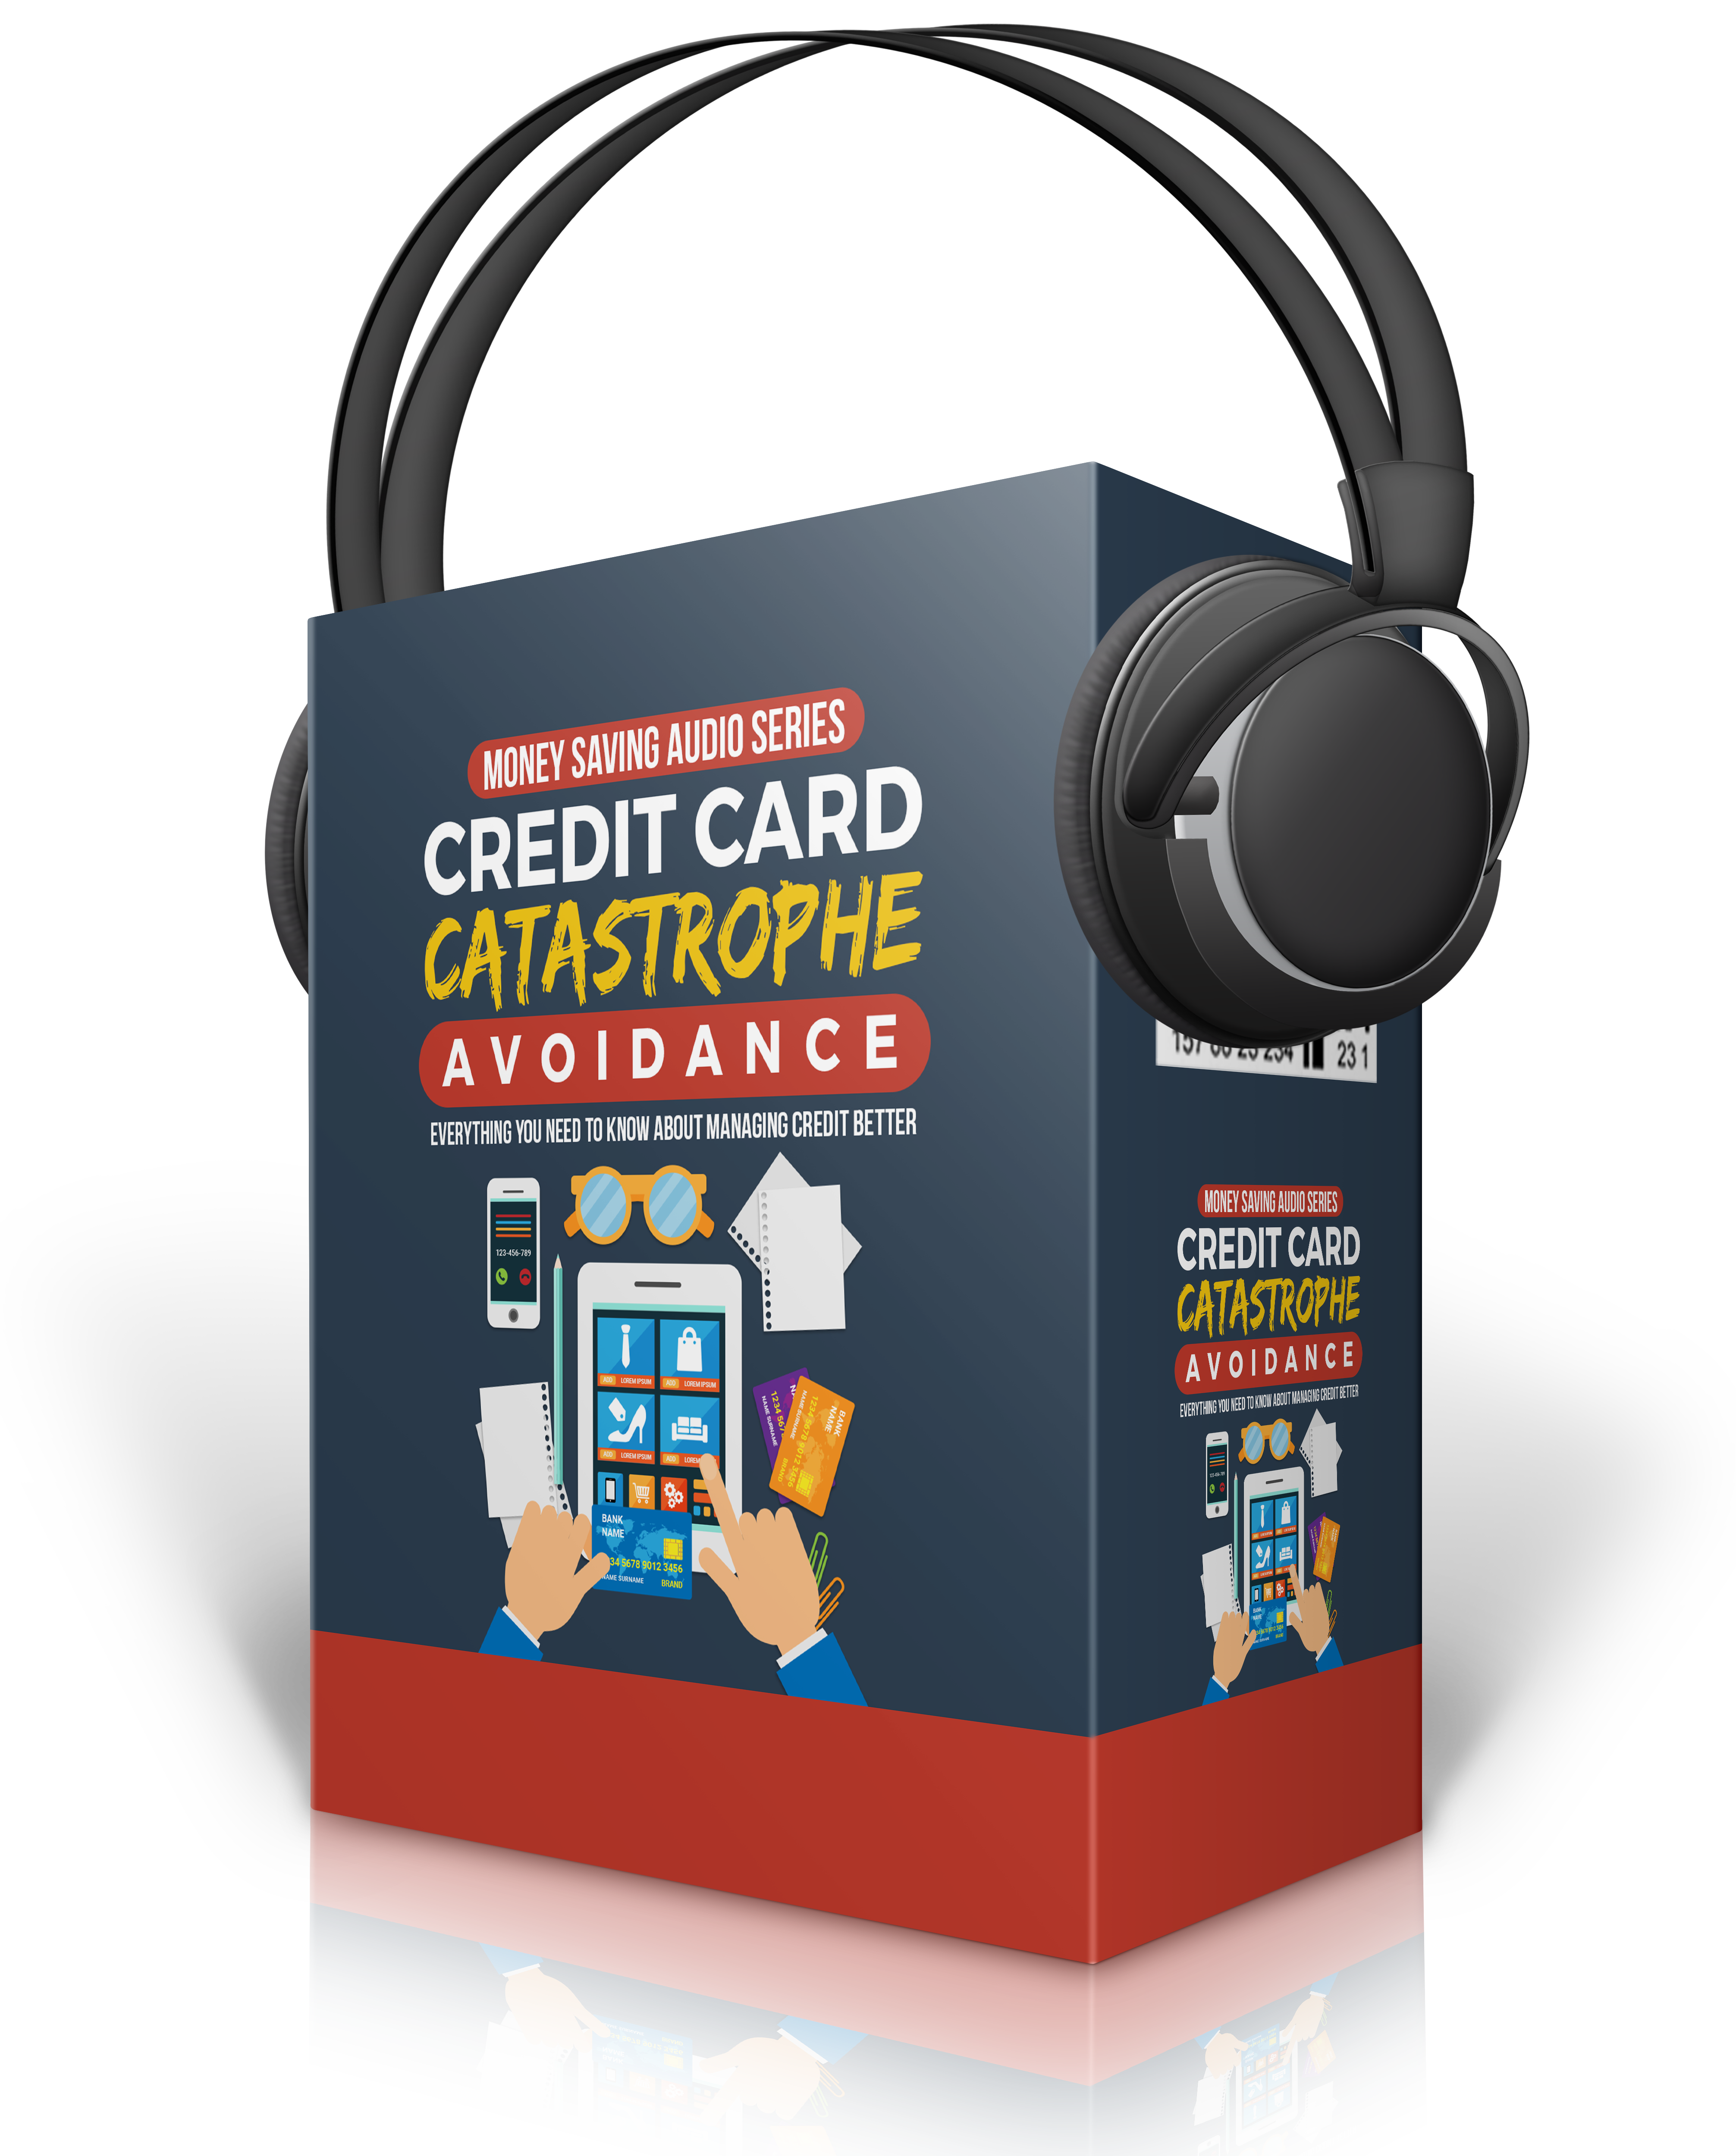 Credit_Card_Catastrophe_Avoidance_2020